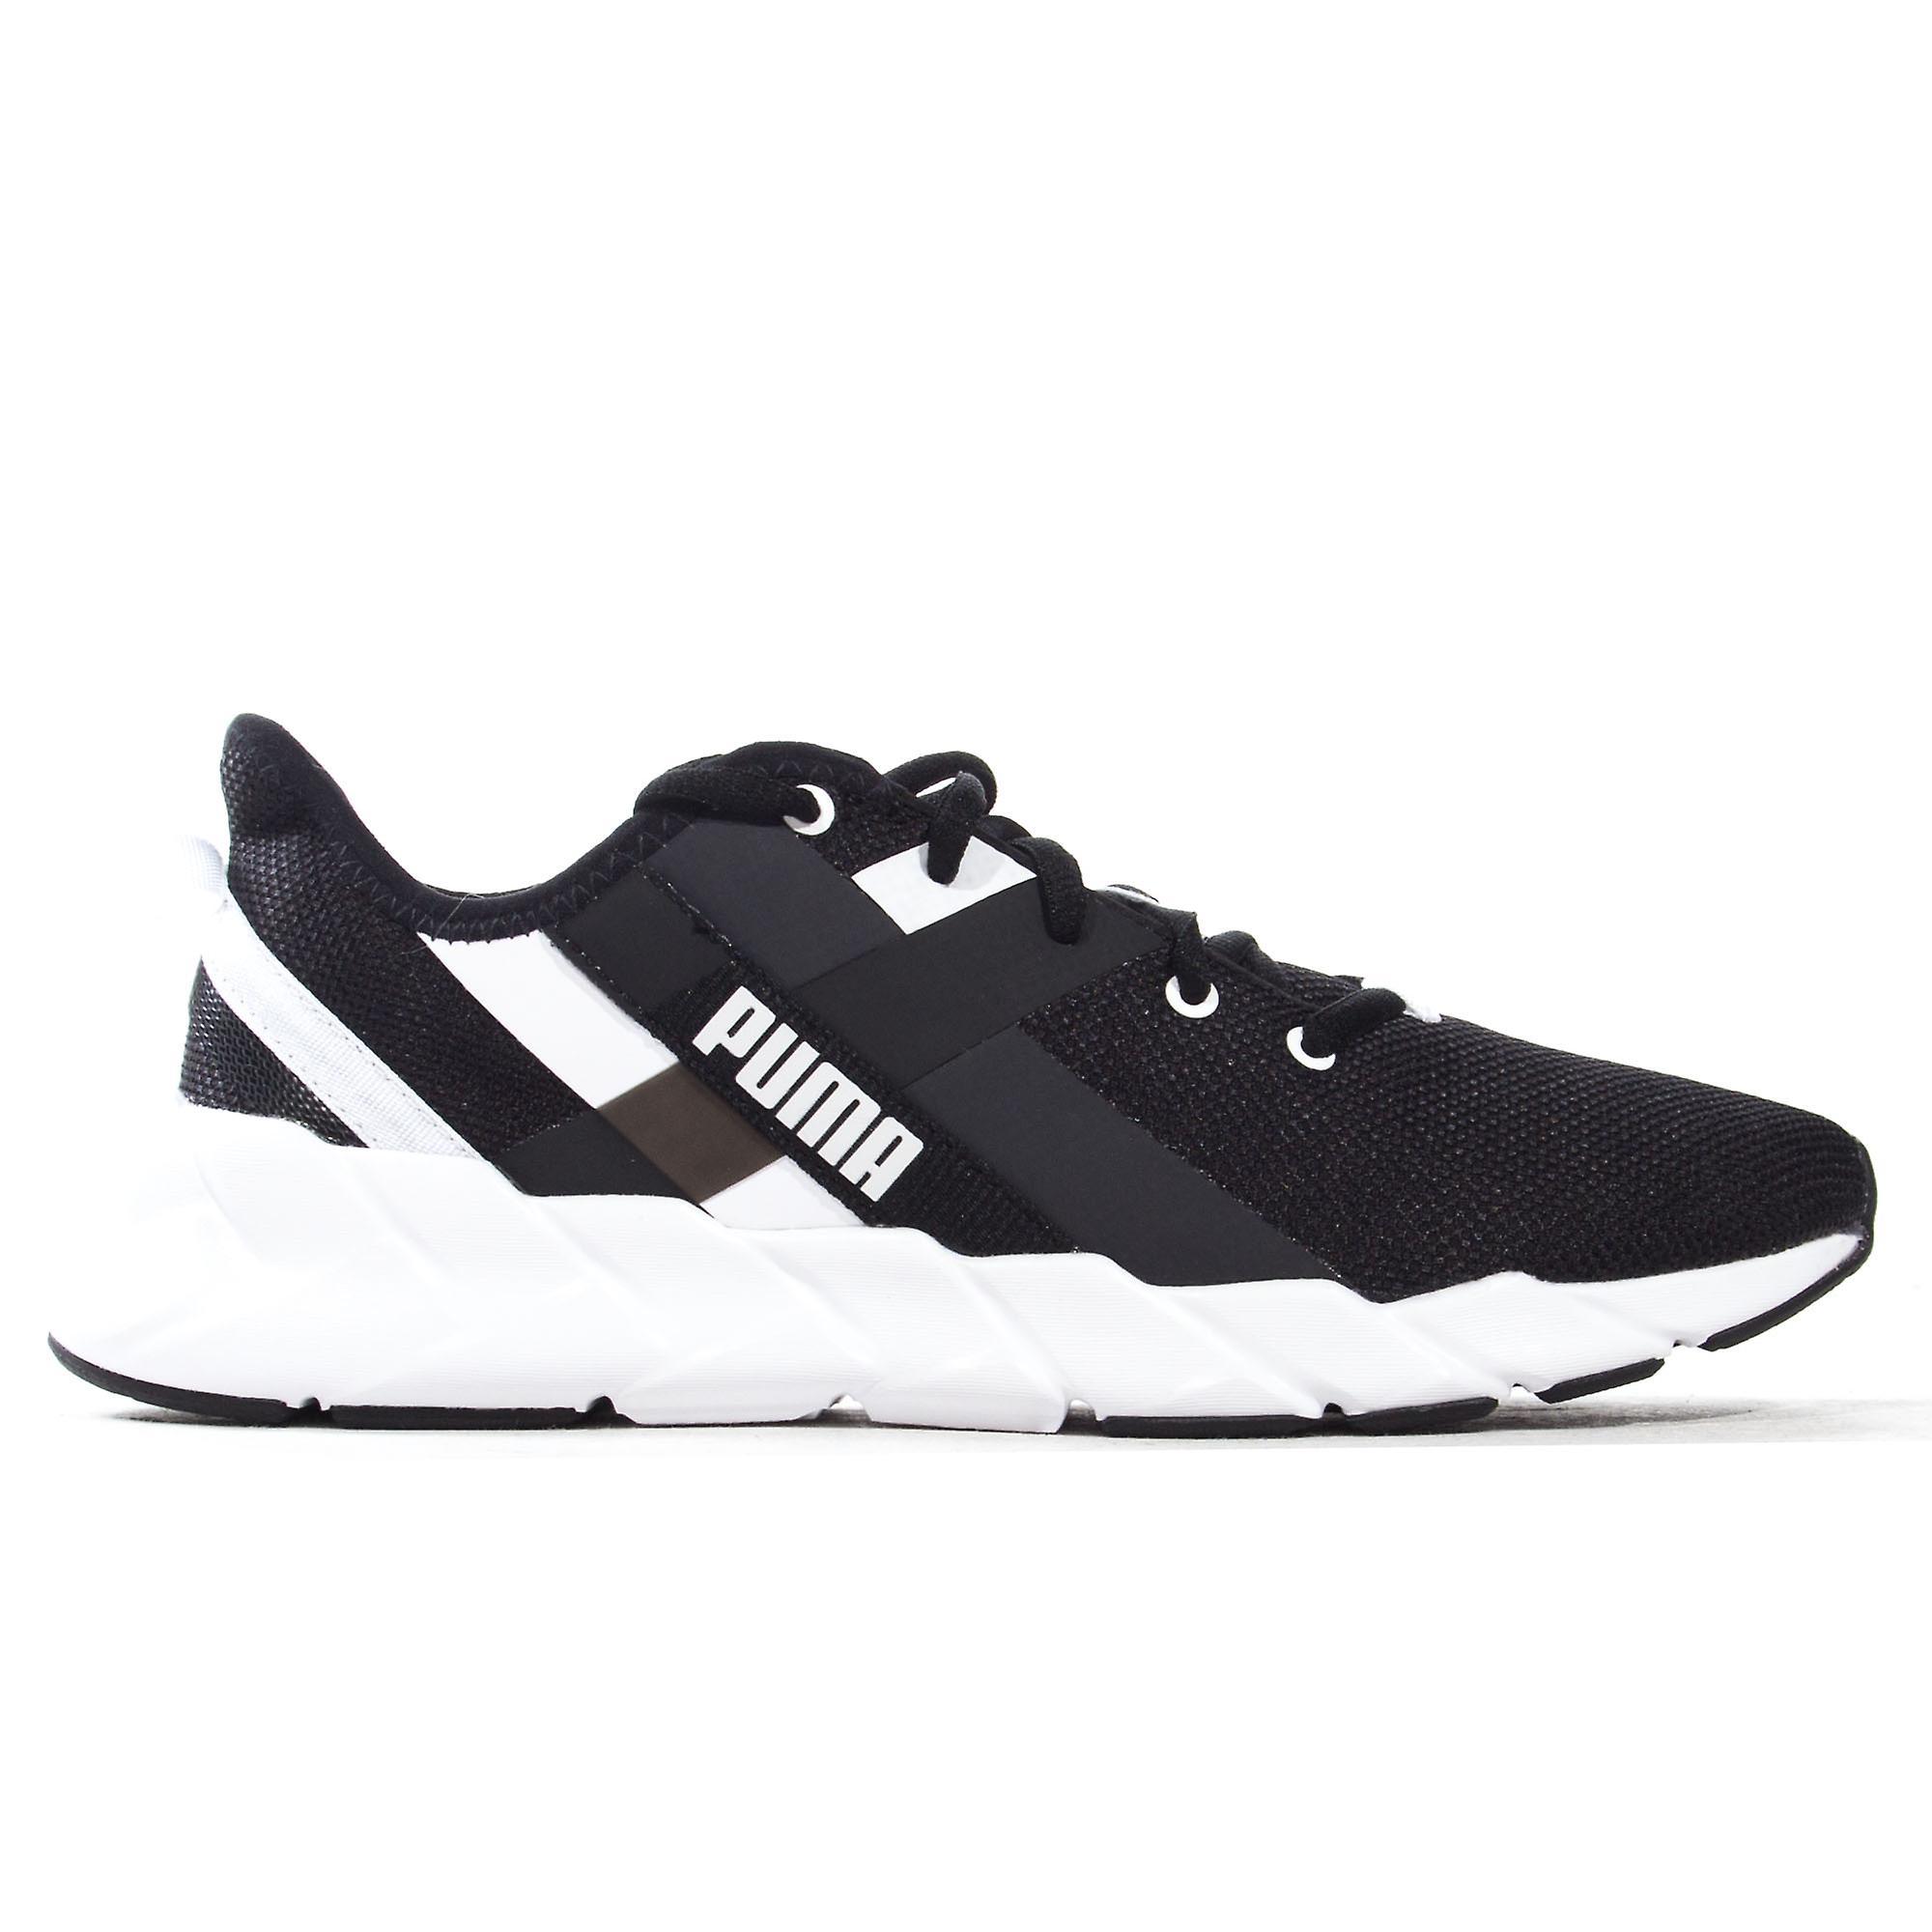 Puma Weave XT Womens Exercise Fitness Training Trainer Shoe Black/White